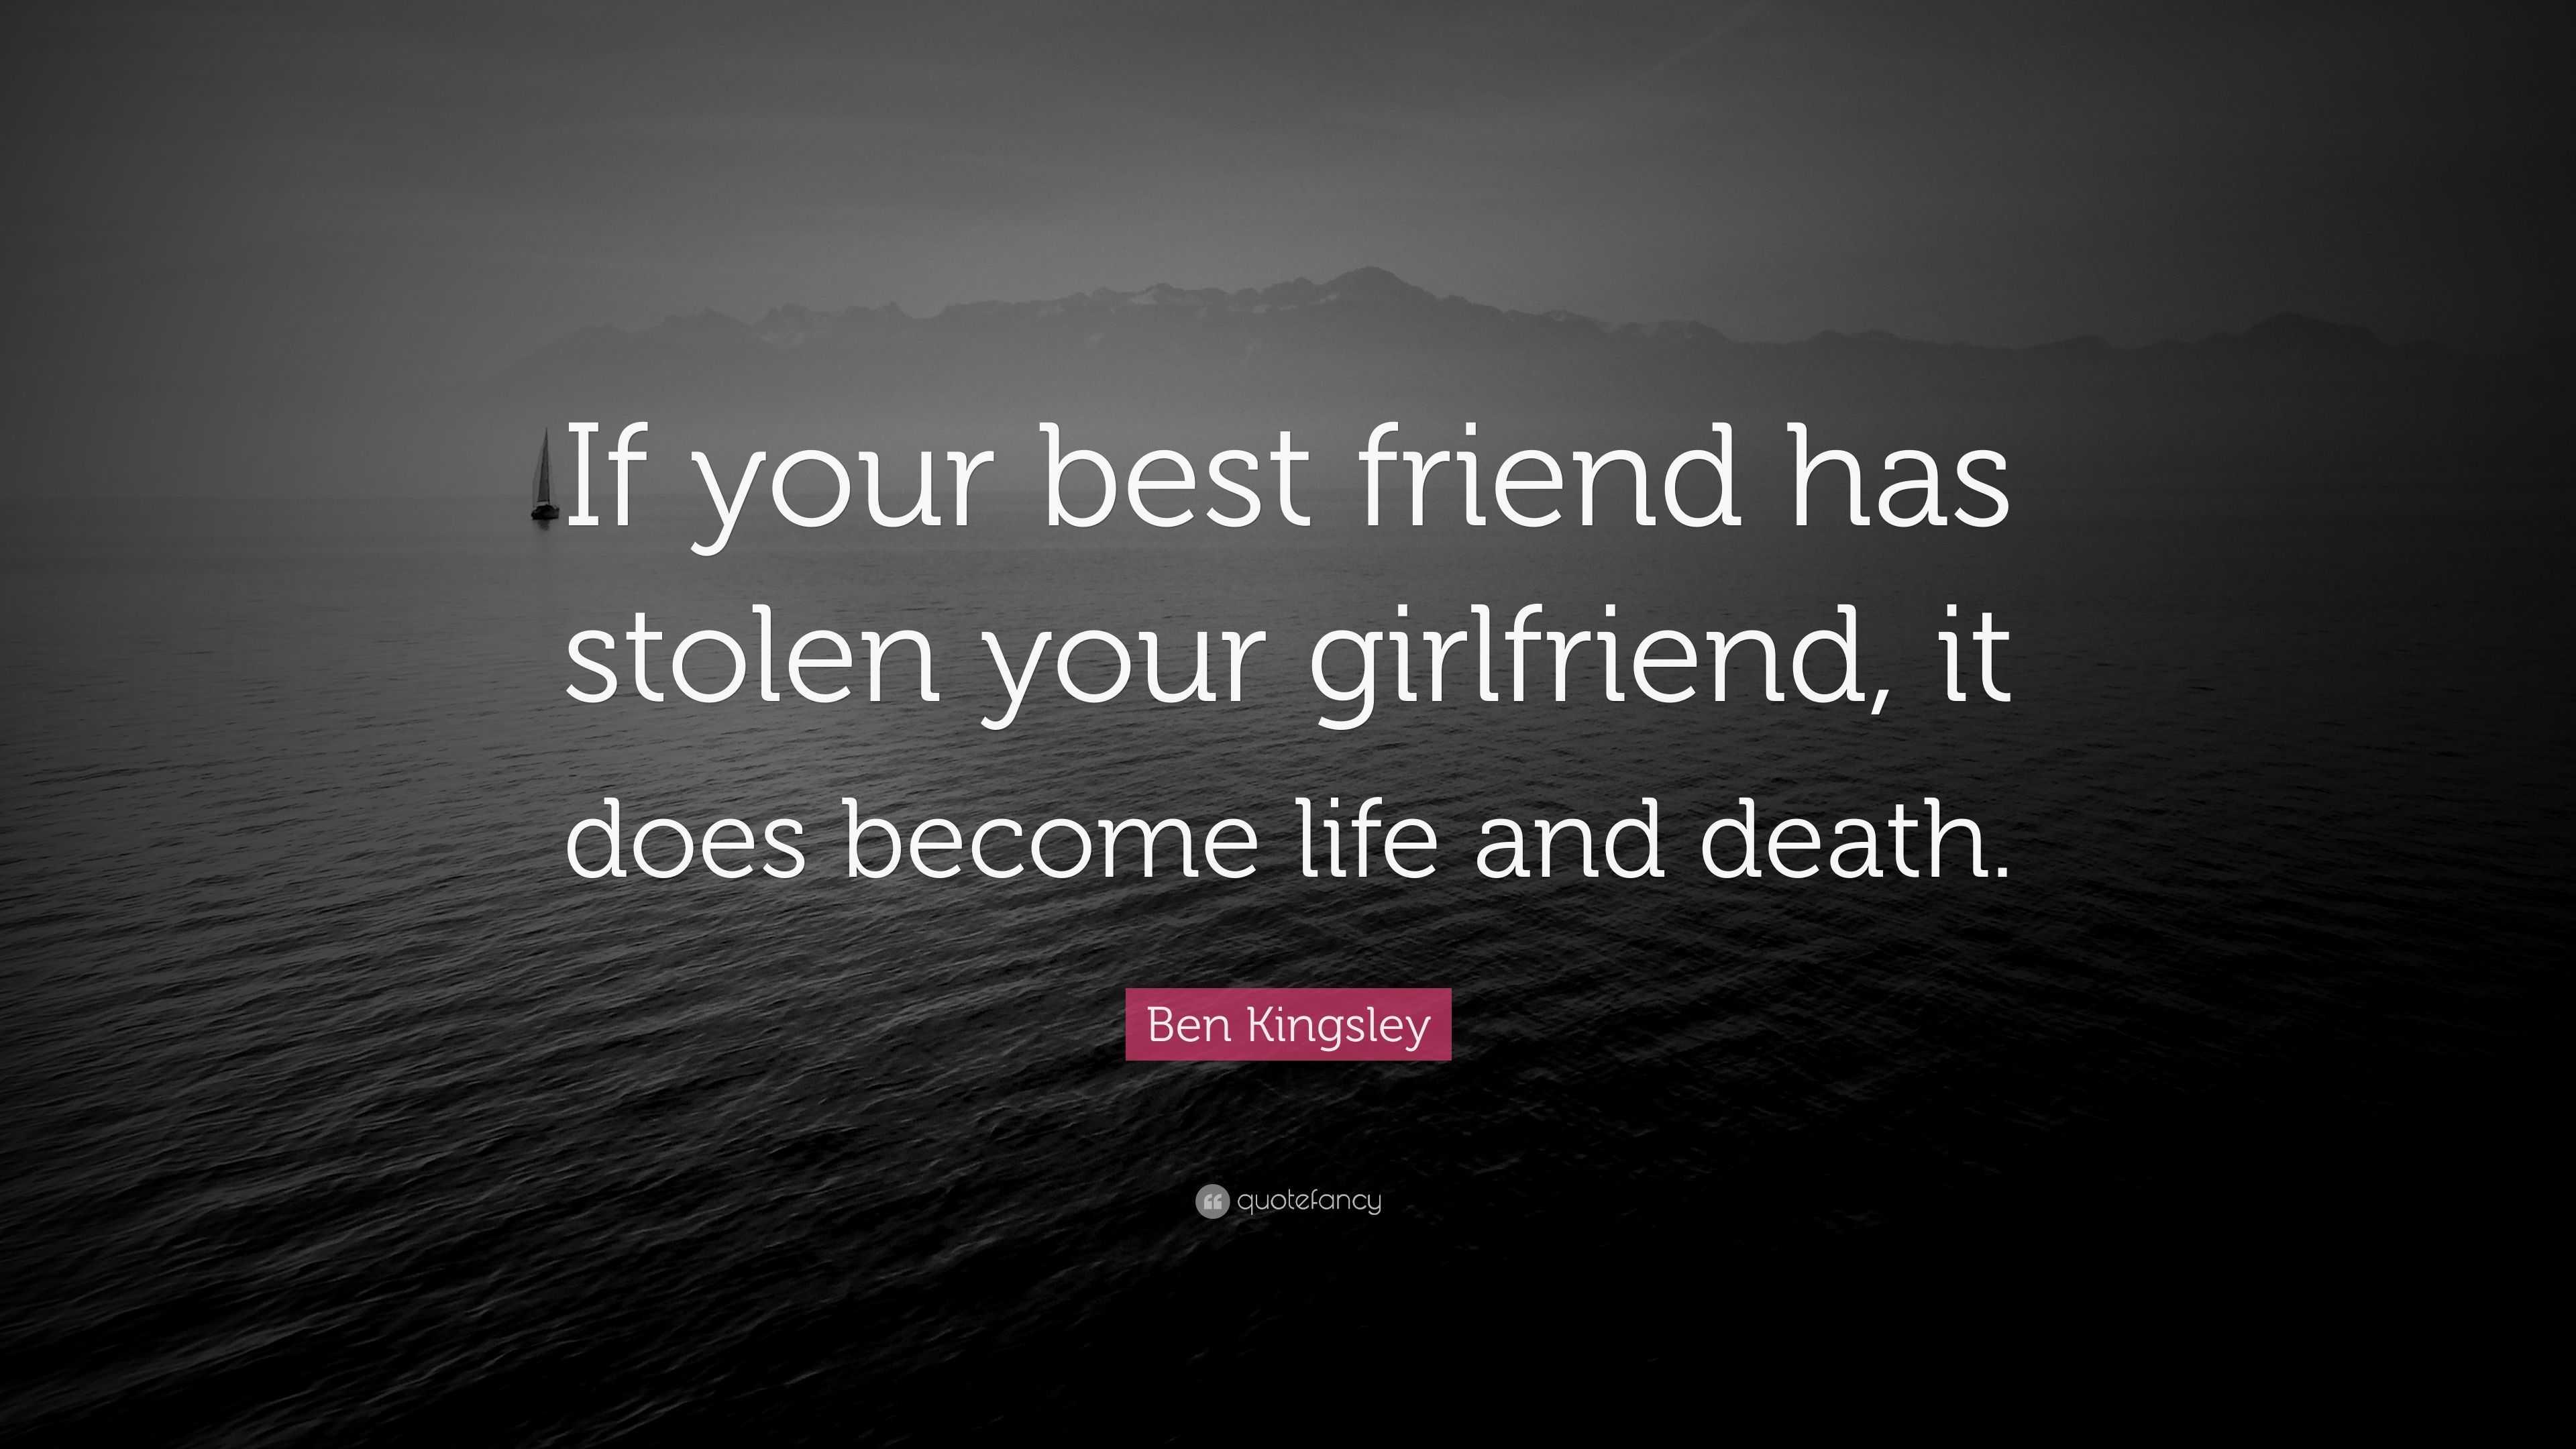 Can a friend become a girlfriend